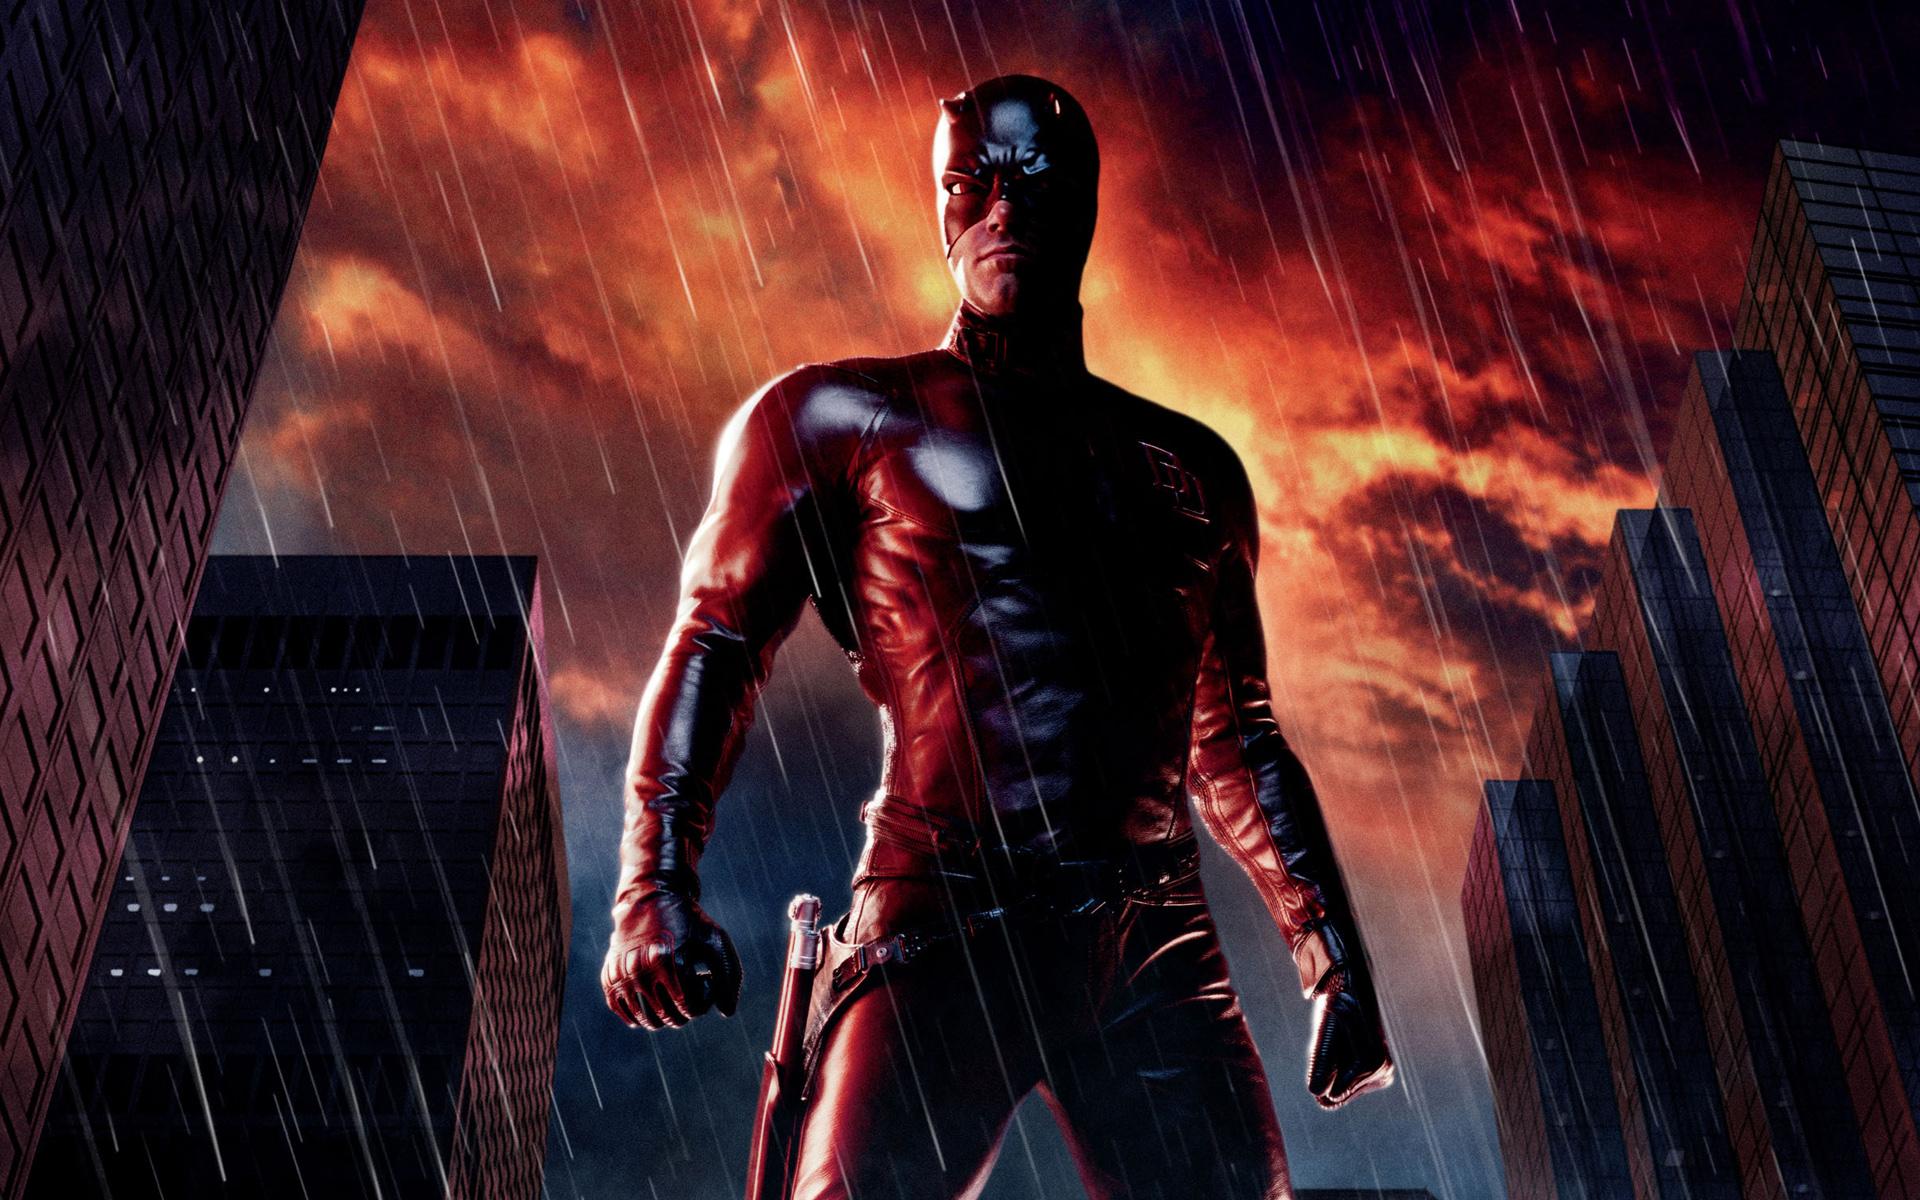 Daredevil Wallpapers Daridevil Marvel Netflix Marvel Séries